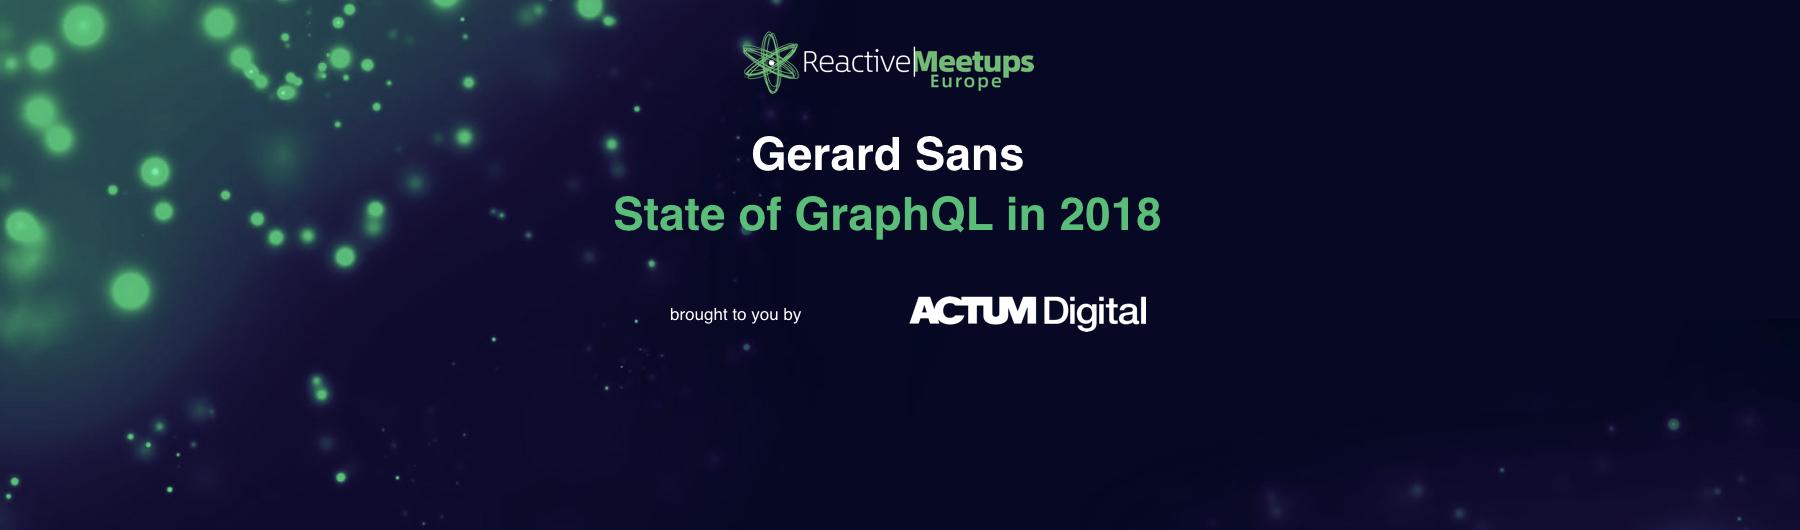 ReactiveMeetups Prague | Gerard Sans